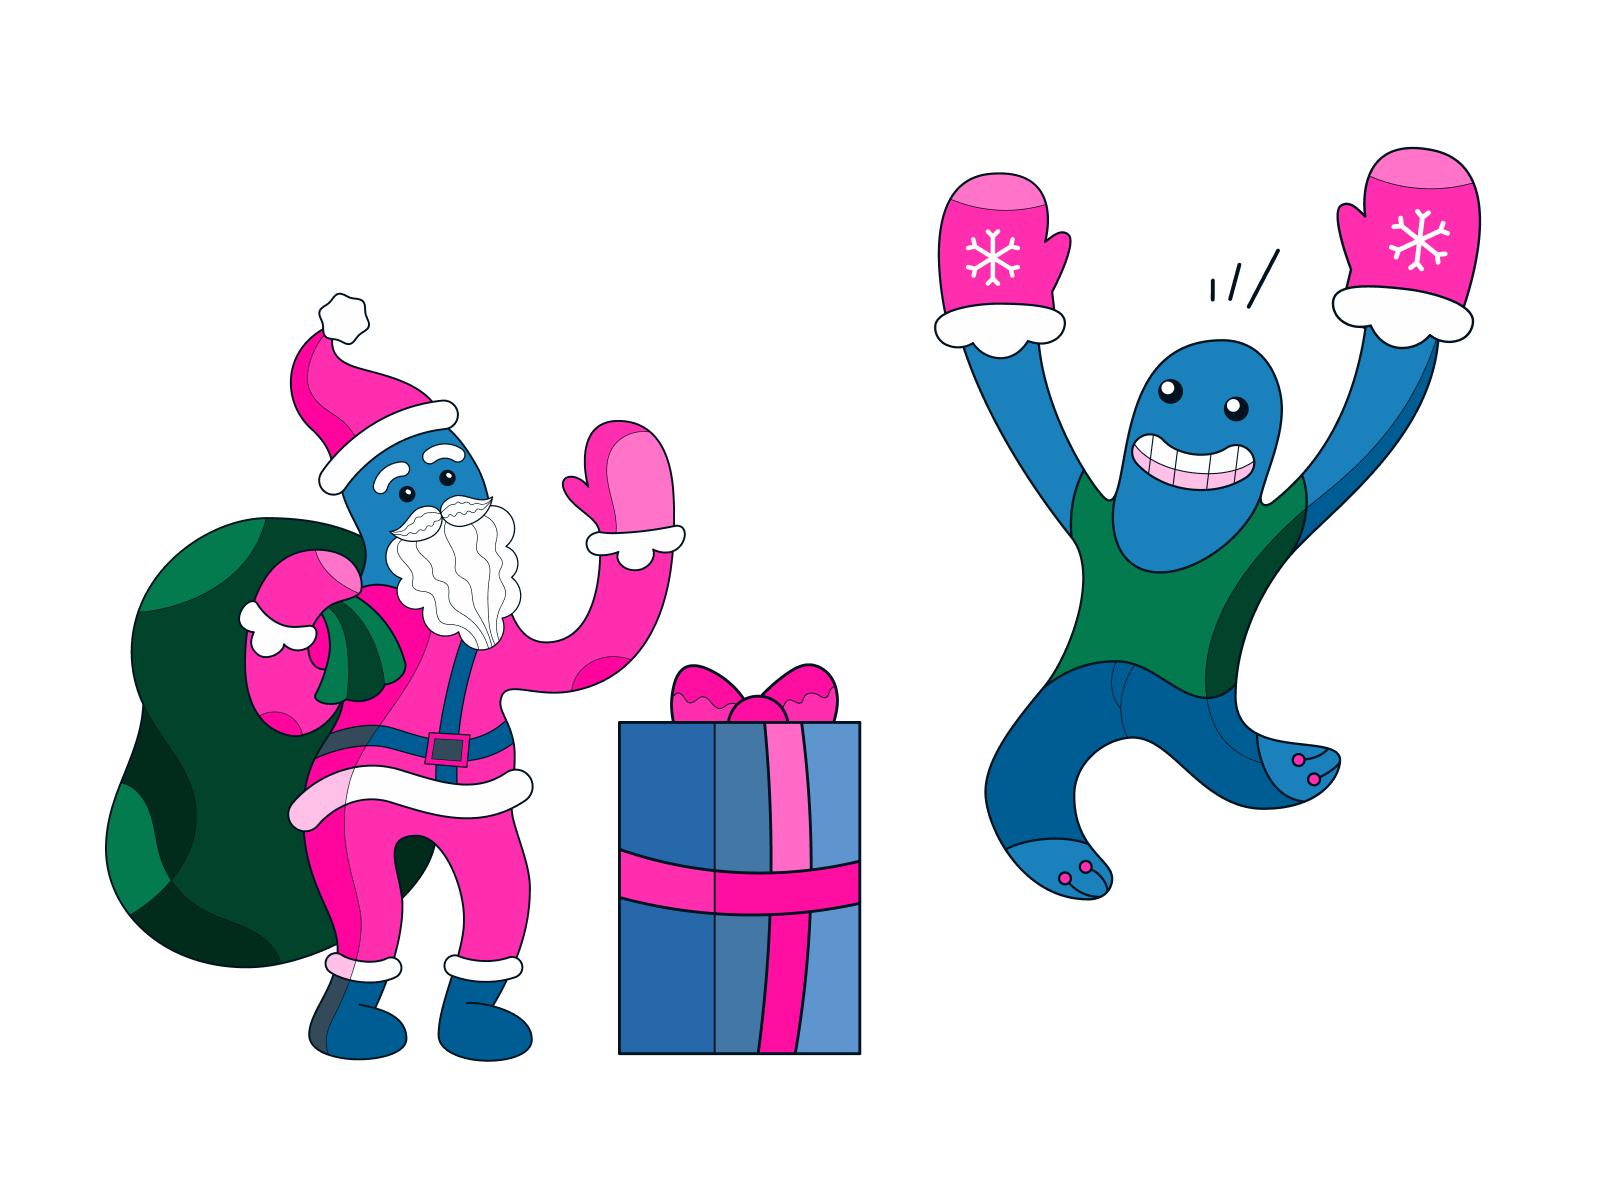 icons8 christmas illustration surr art